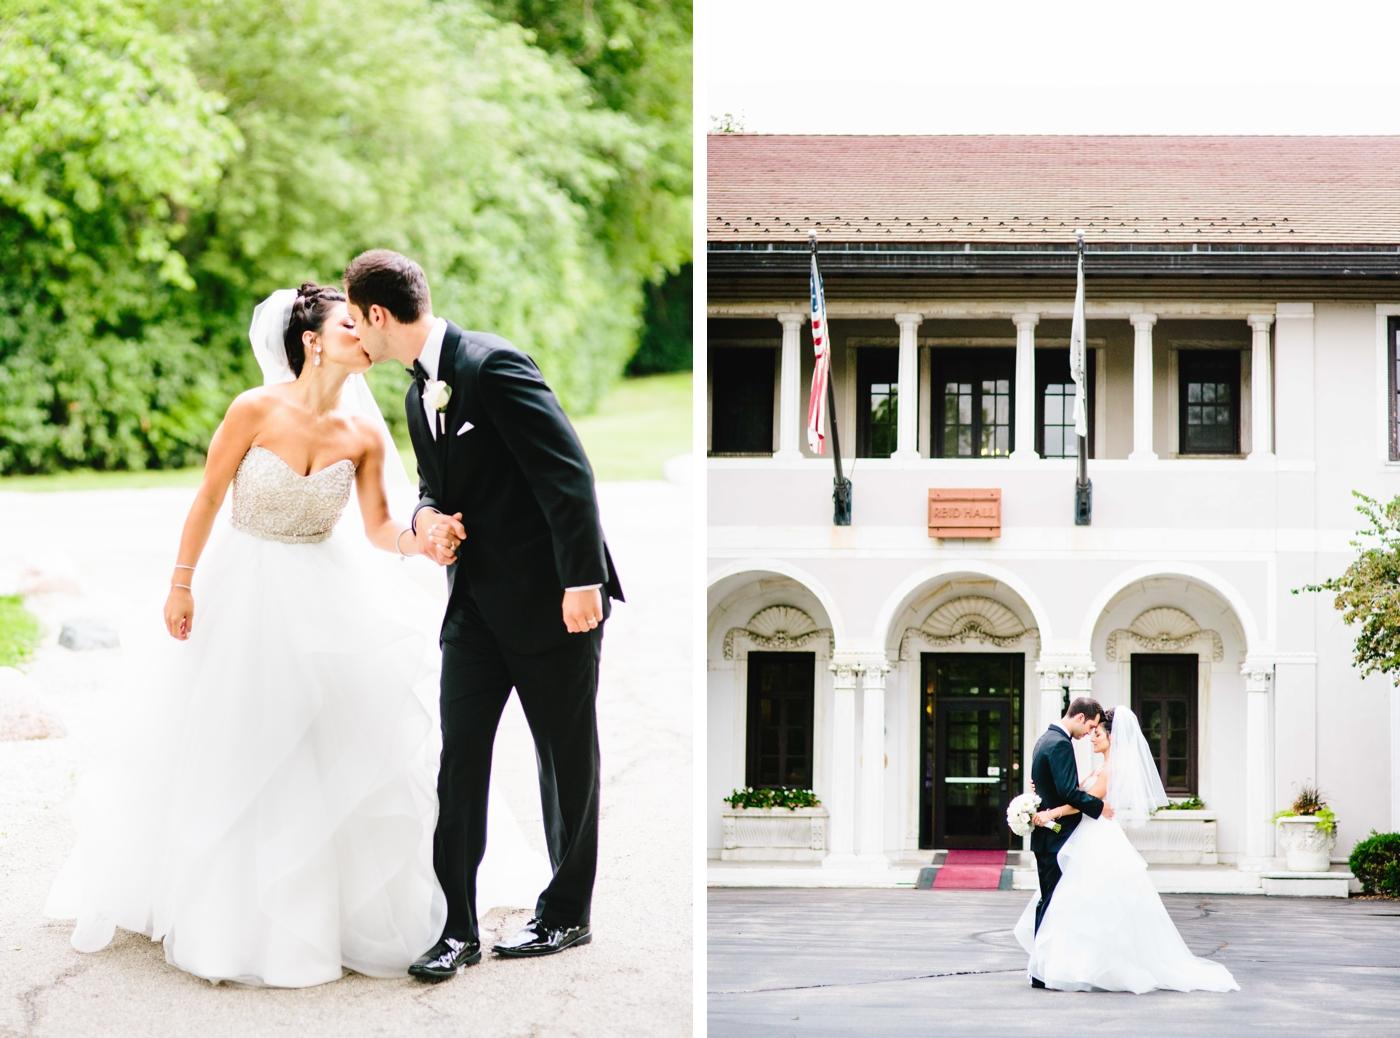 chicago-fine-art-wedding-photography-smeja38